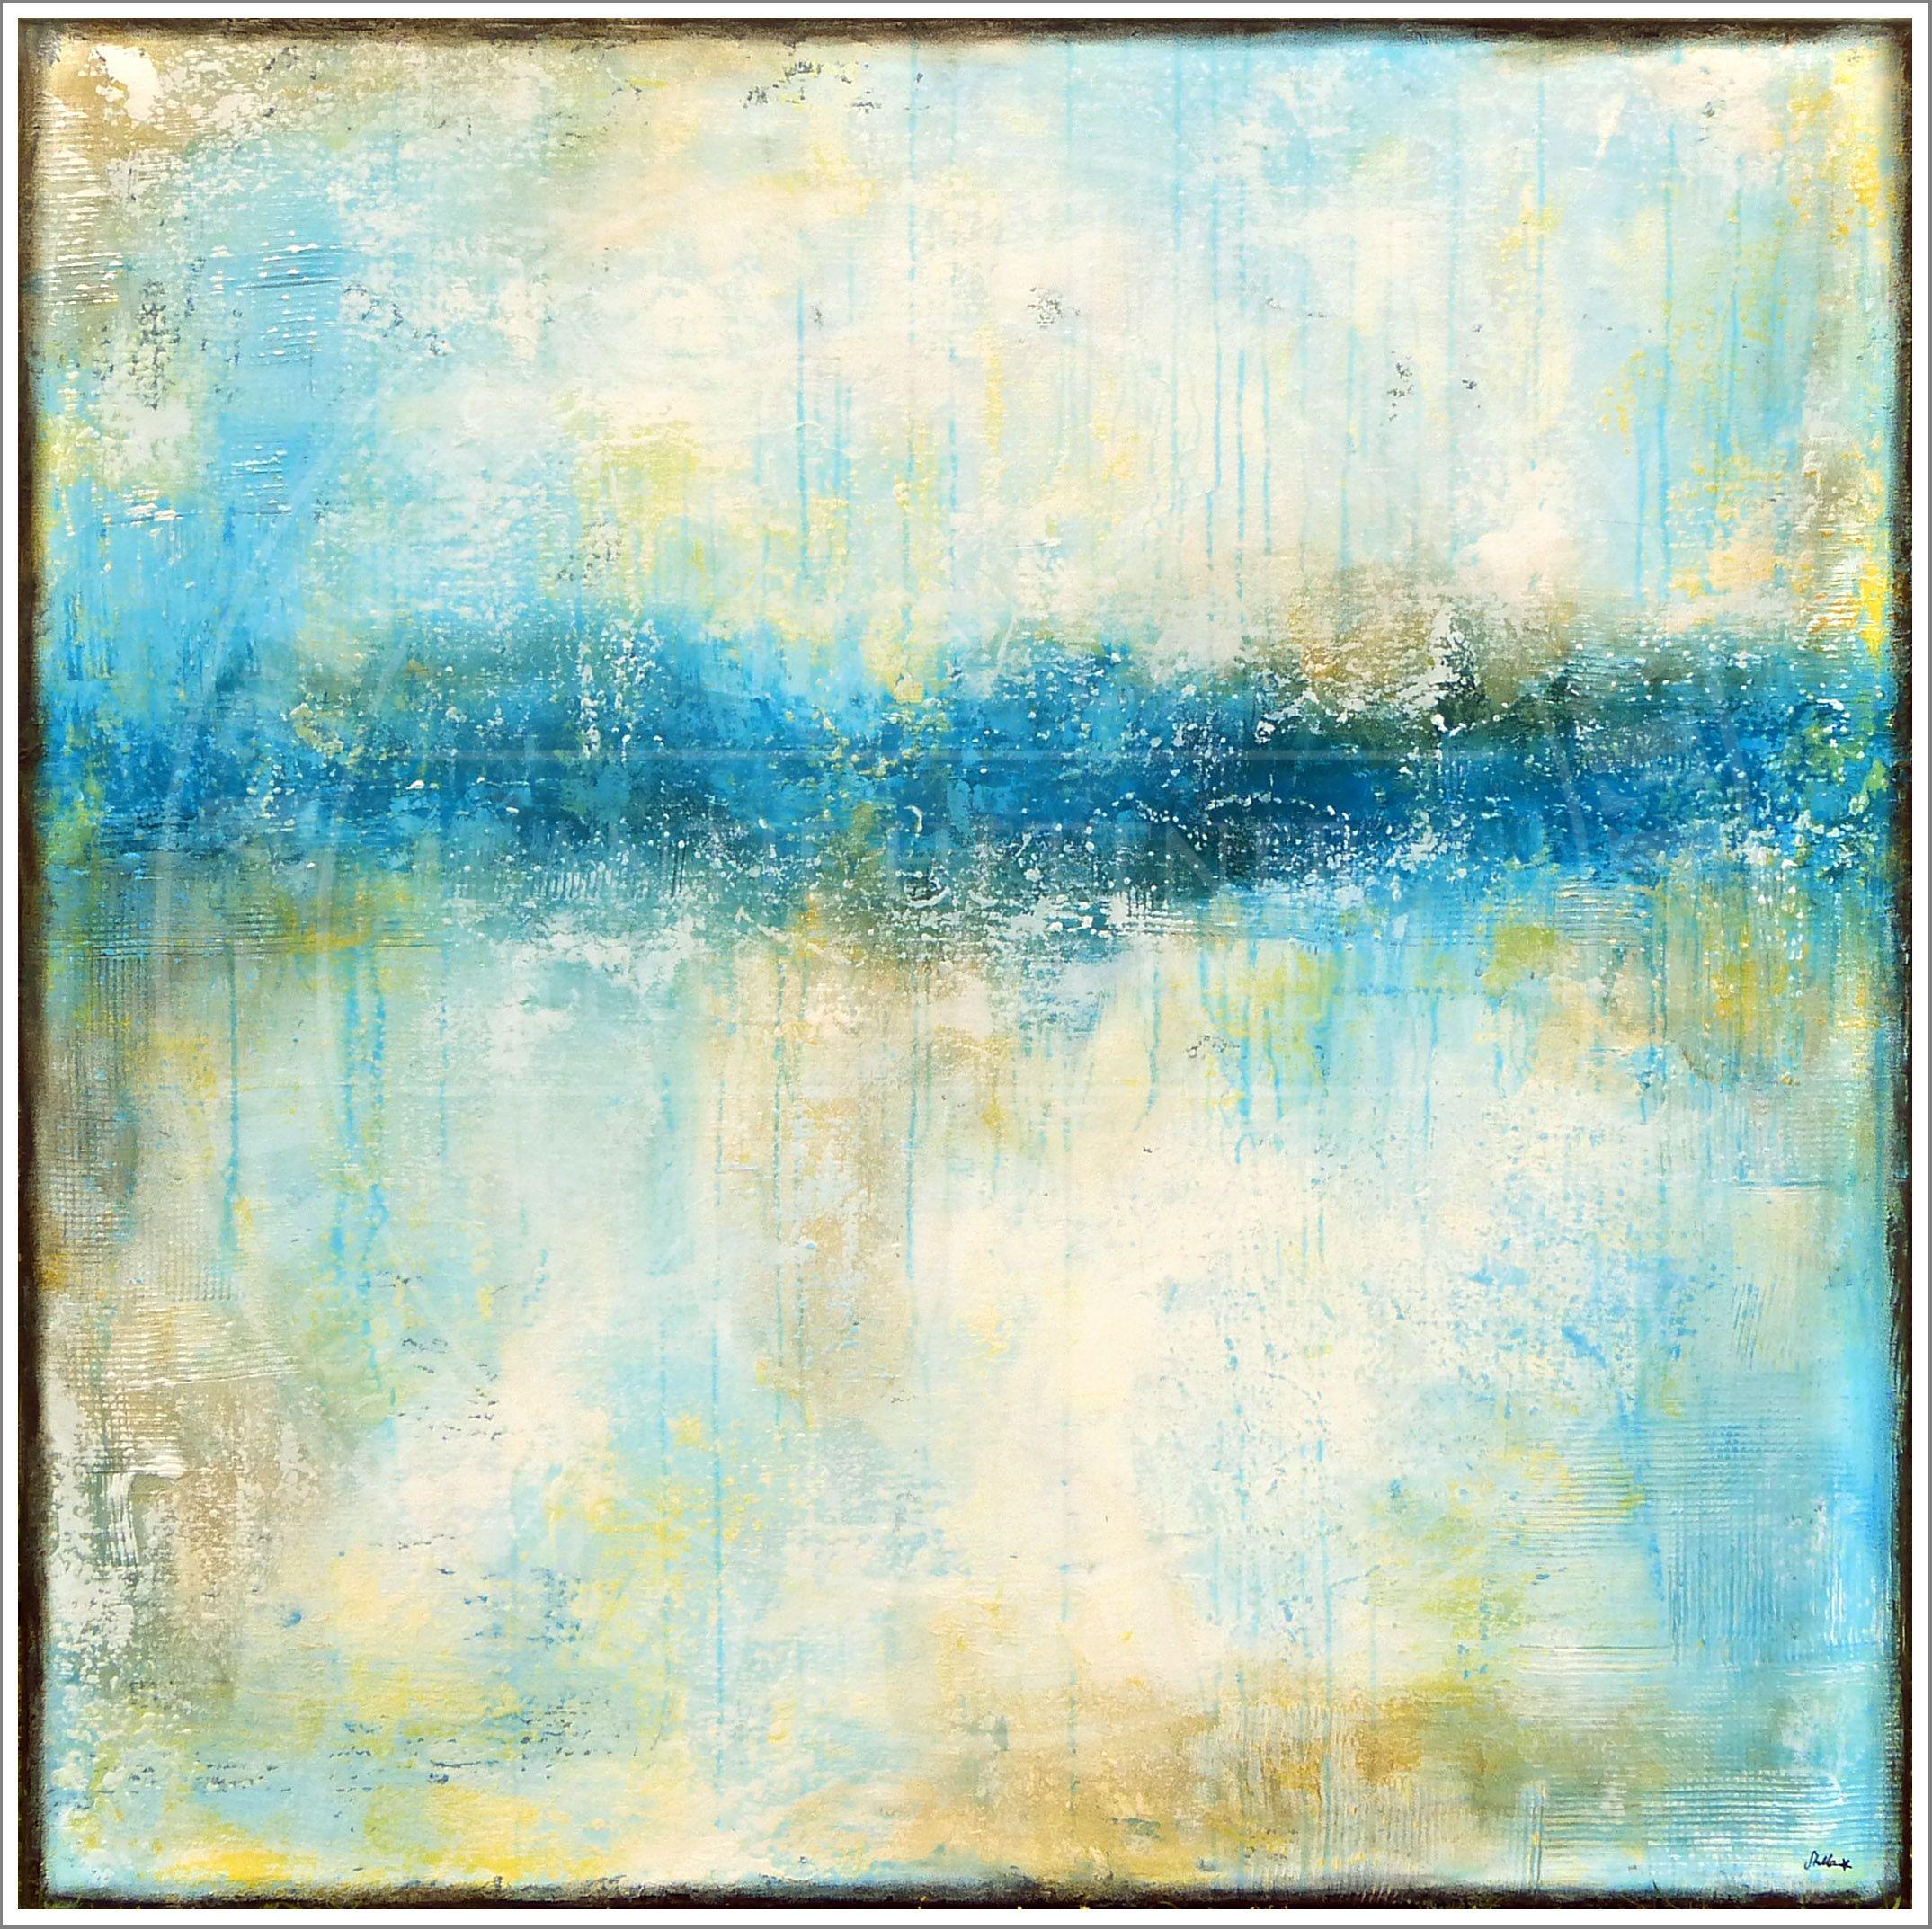 """bounty breeze"" acrylic on canvas by Stella Hettner"